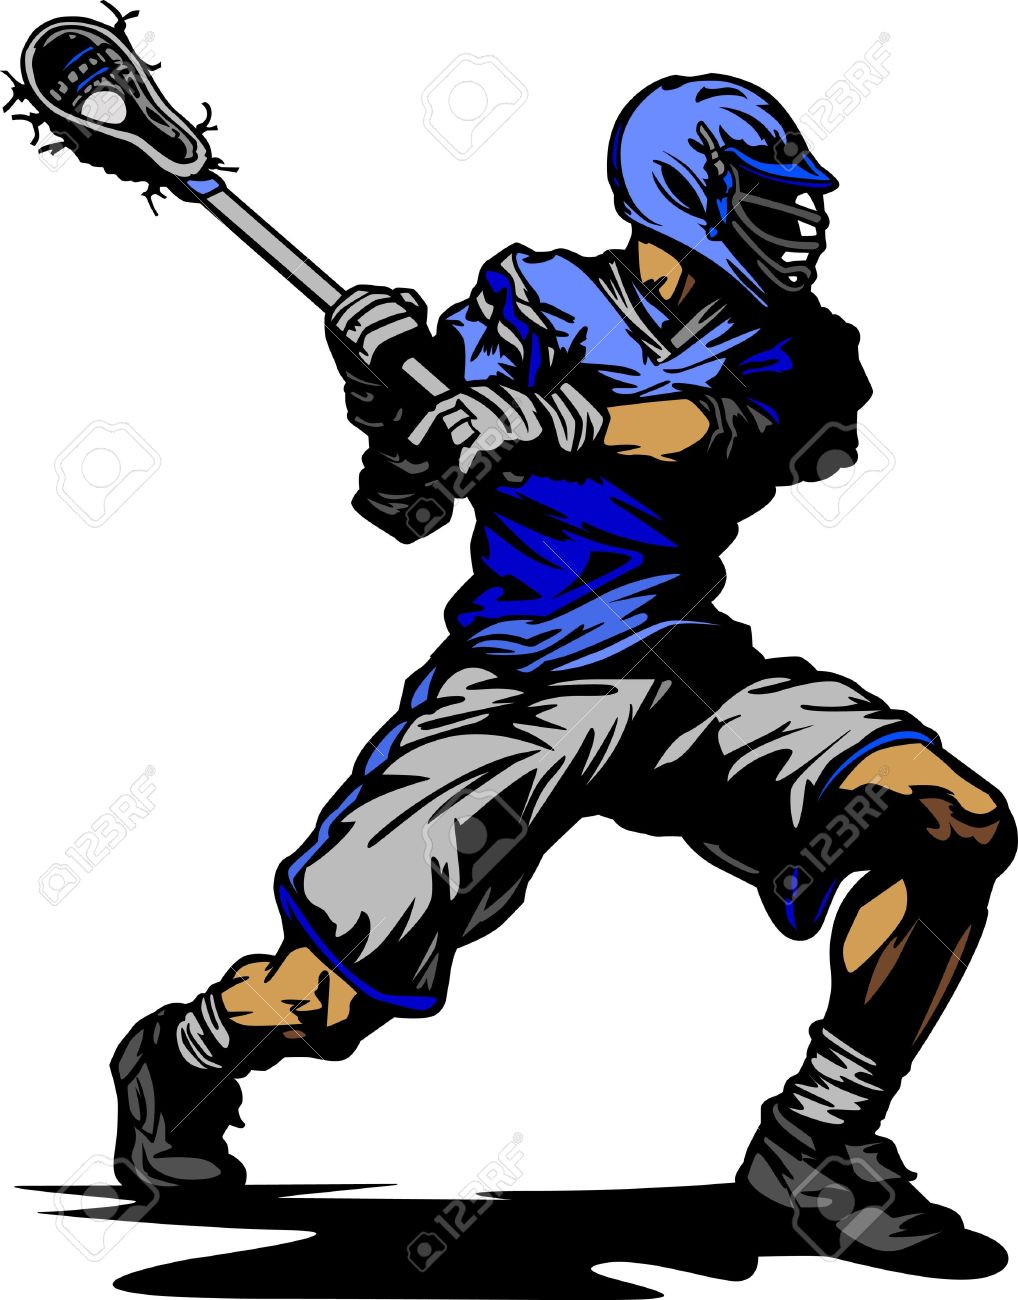 Lacrosse Player Cradling Ball Vector Illustration Stock Vector - 10901994